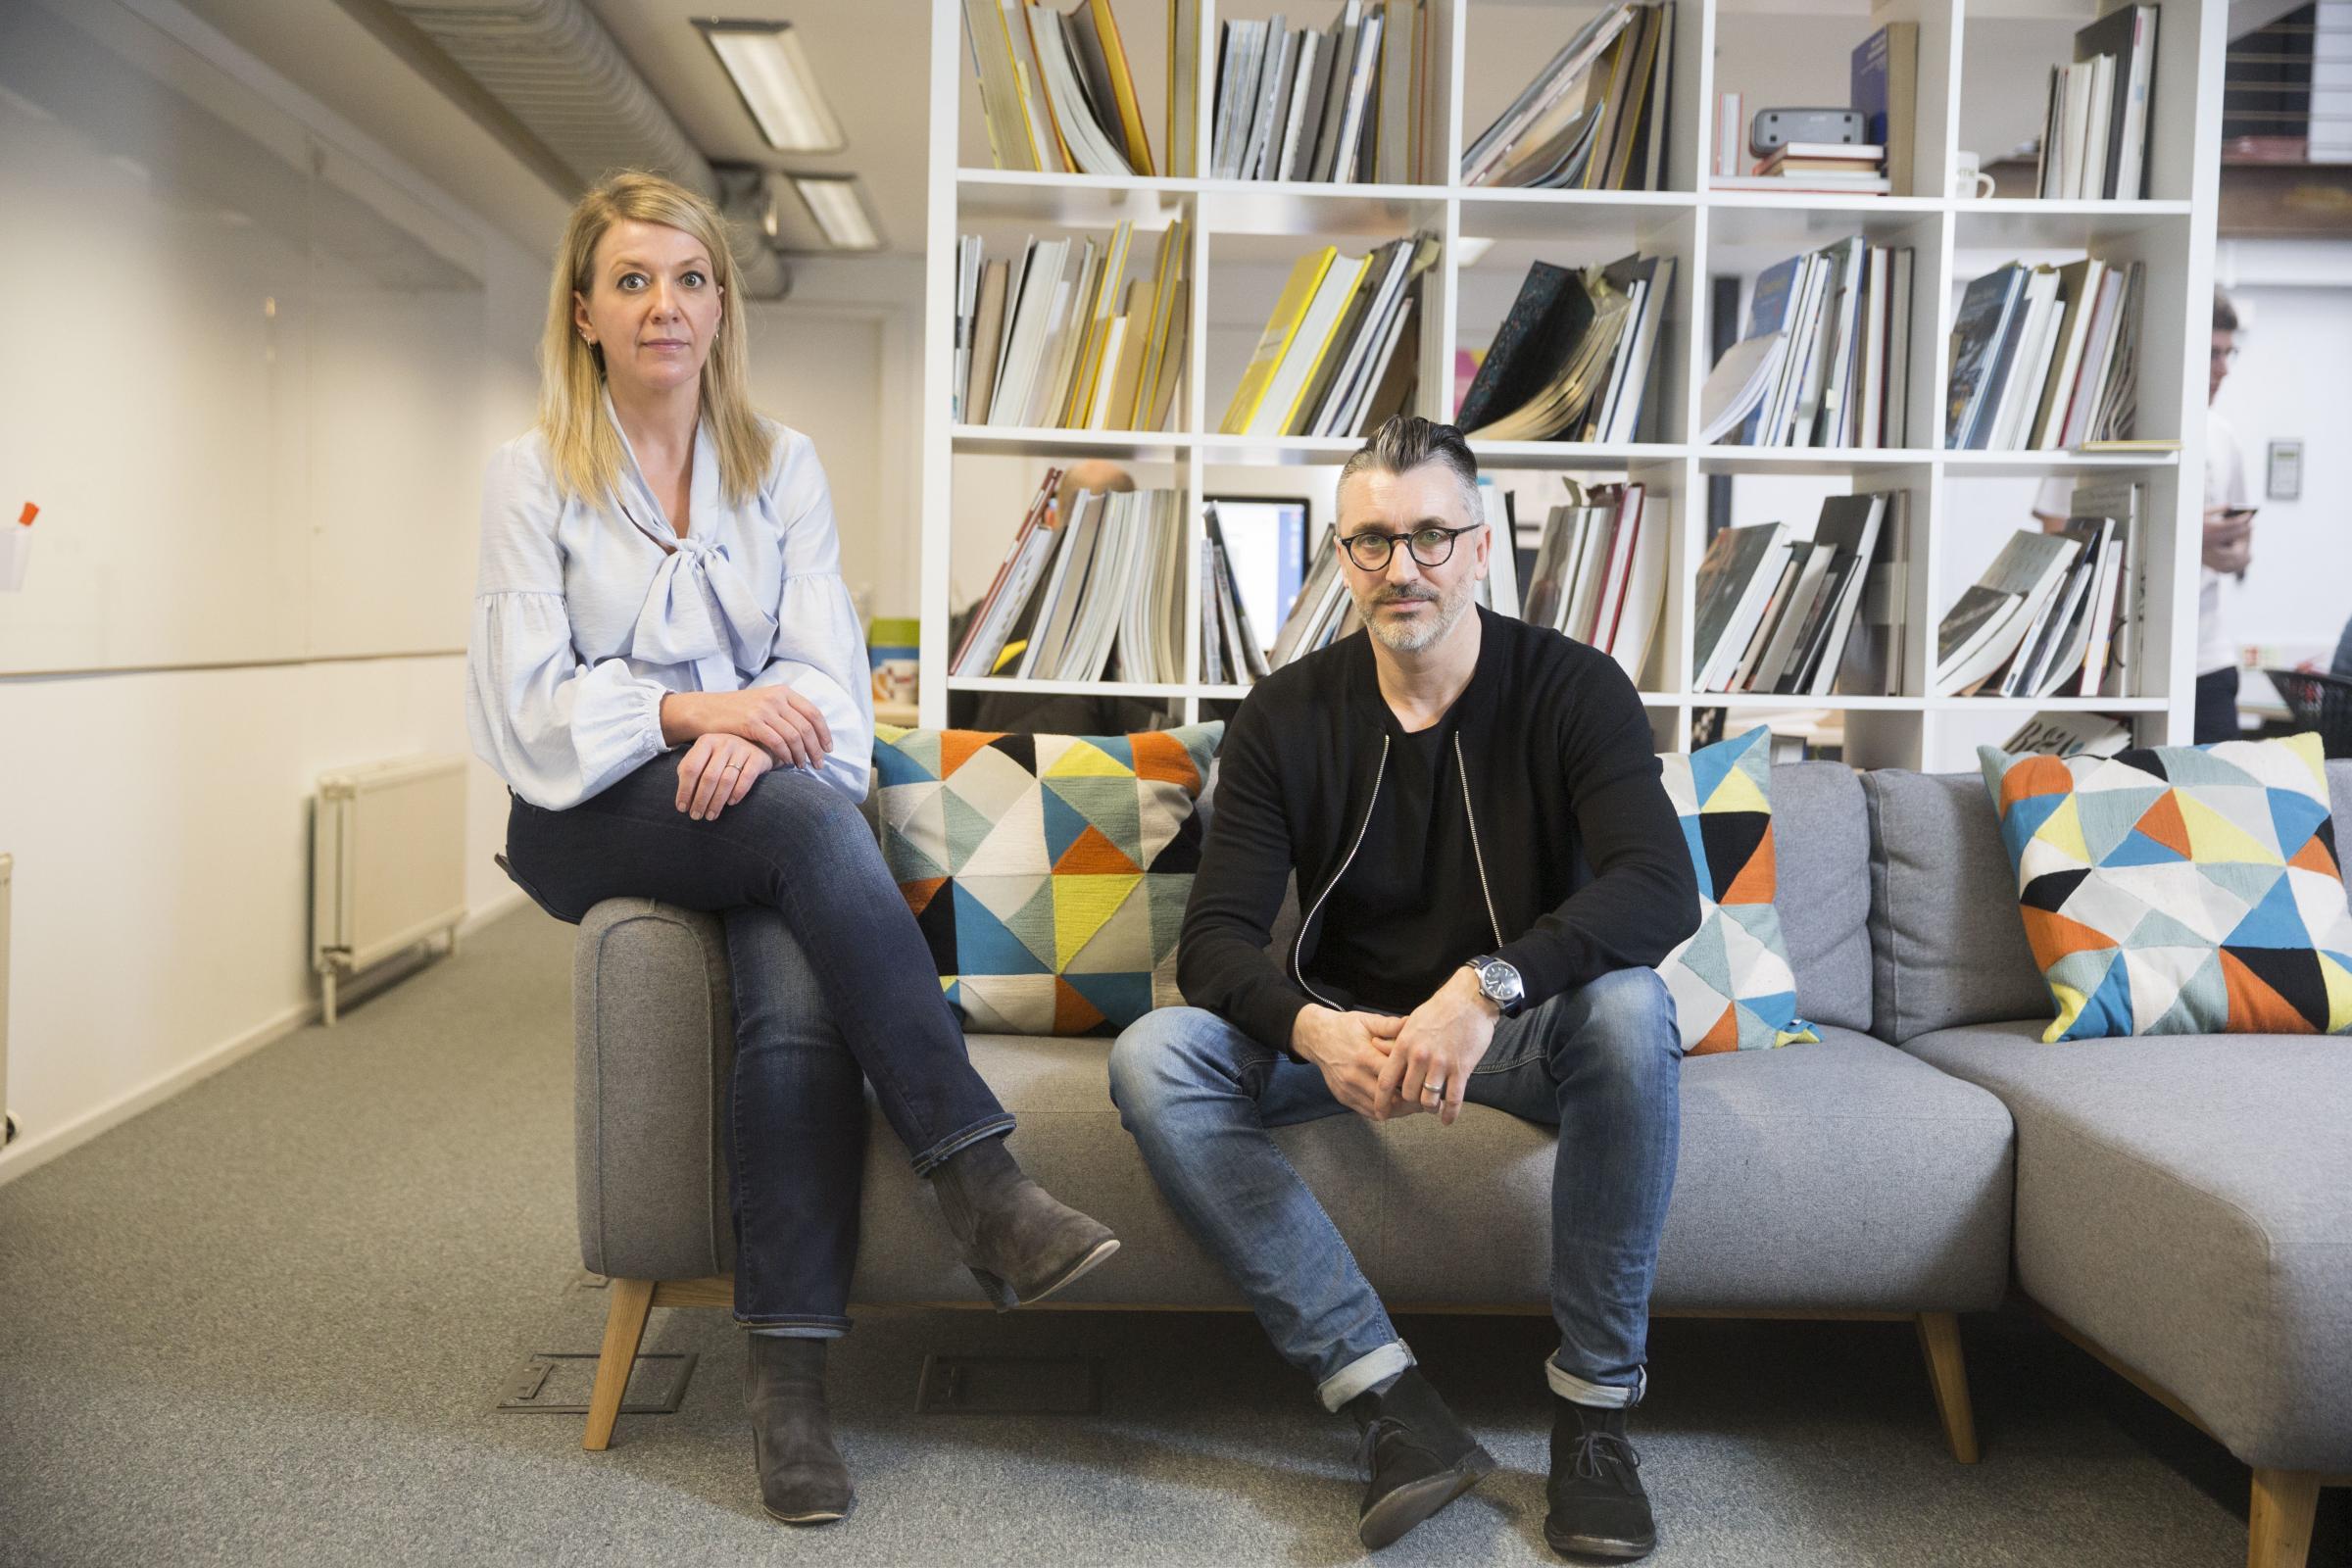 Glasgow agency installs new leadership team